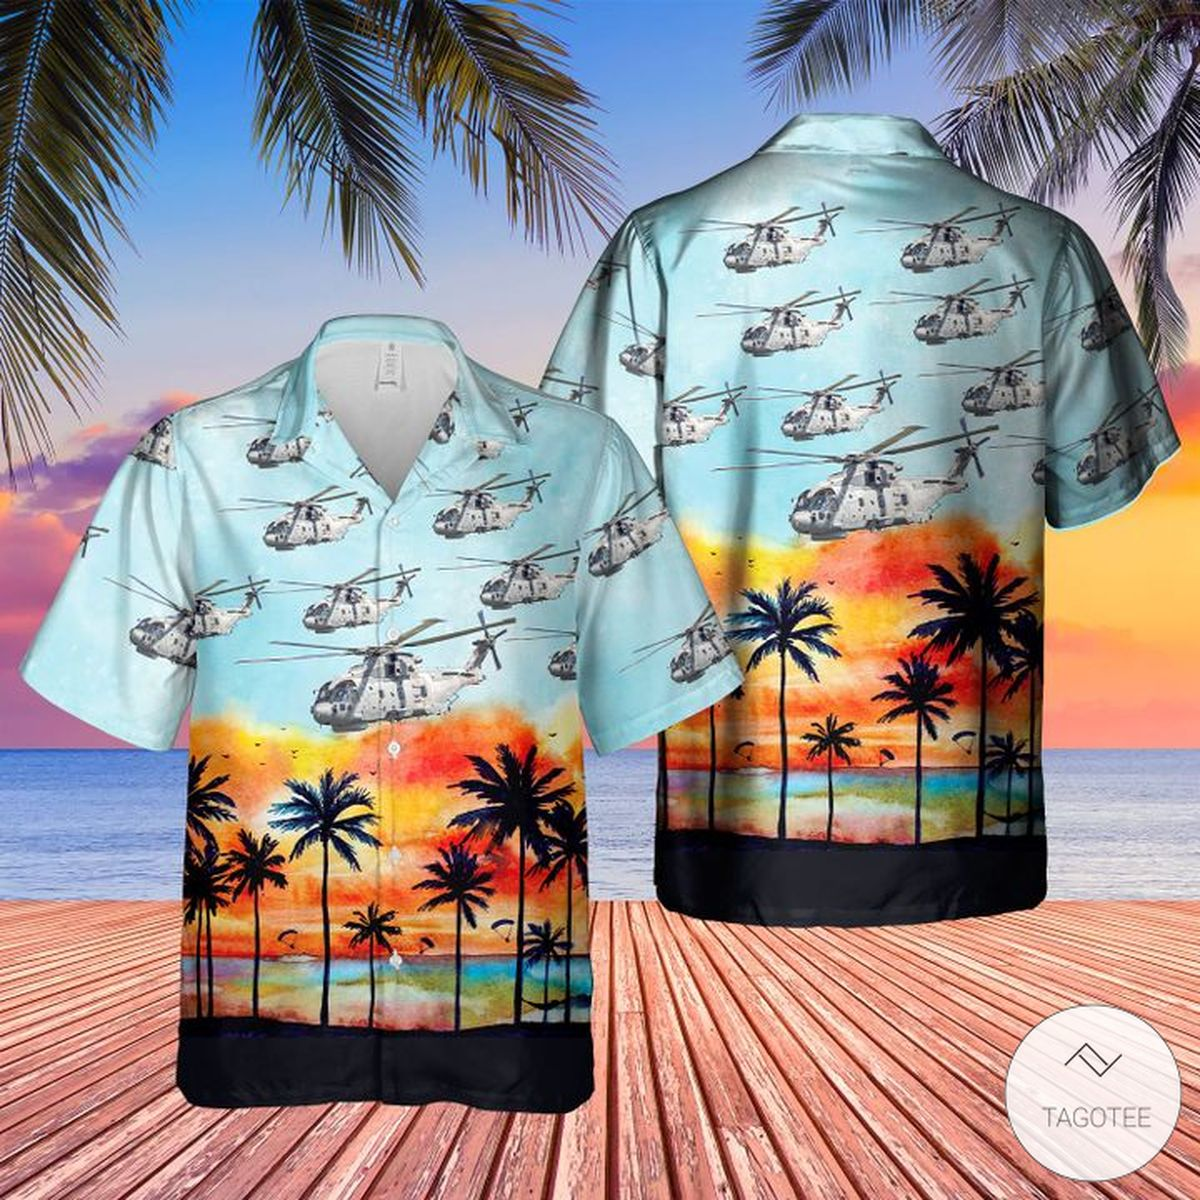 Royal Navy Merlin Hm Mk4 Hawaiian Shirt, Beach Shorts